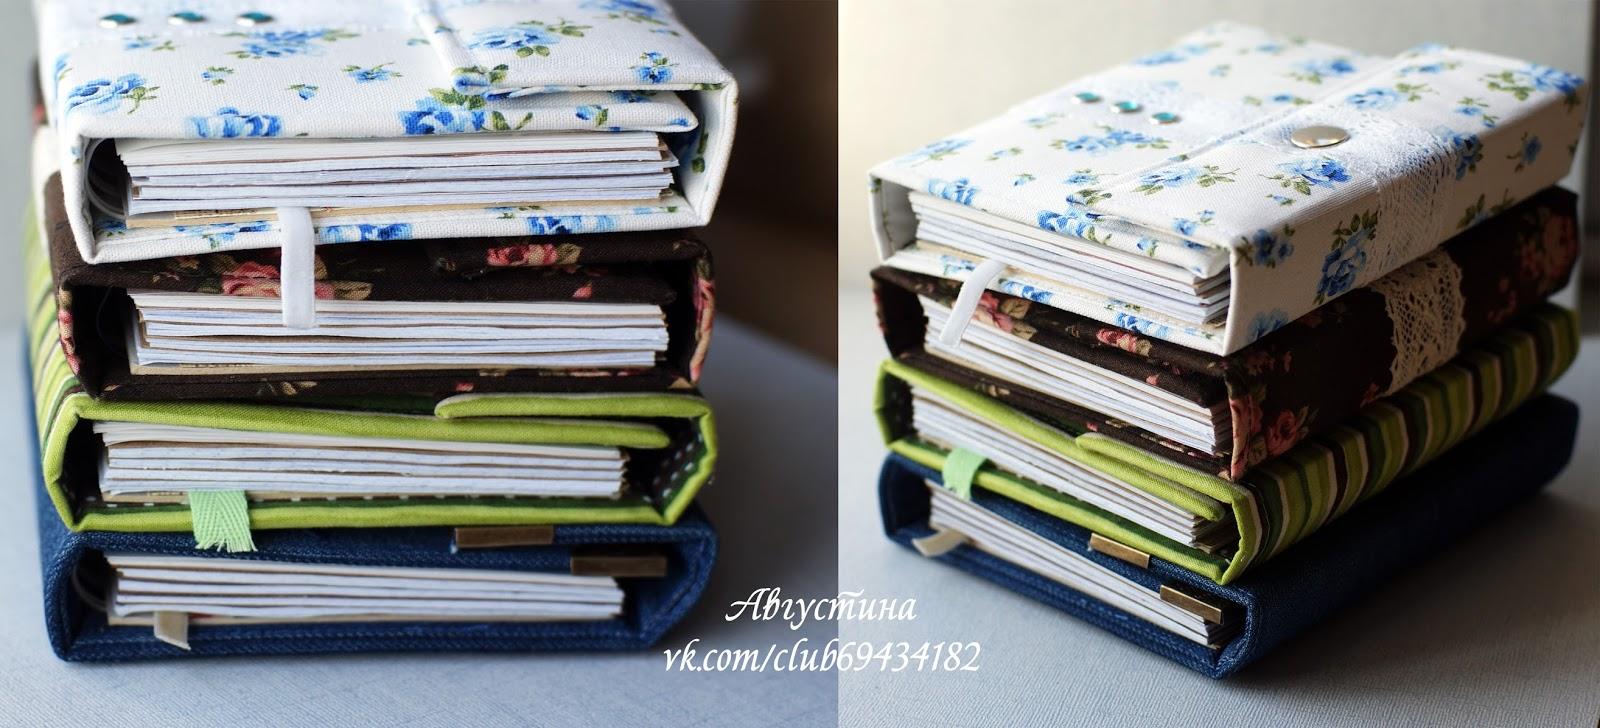 Trevel Book, блокноты, буки